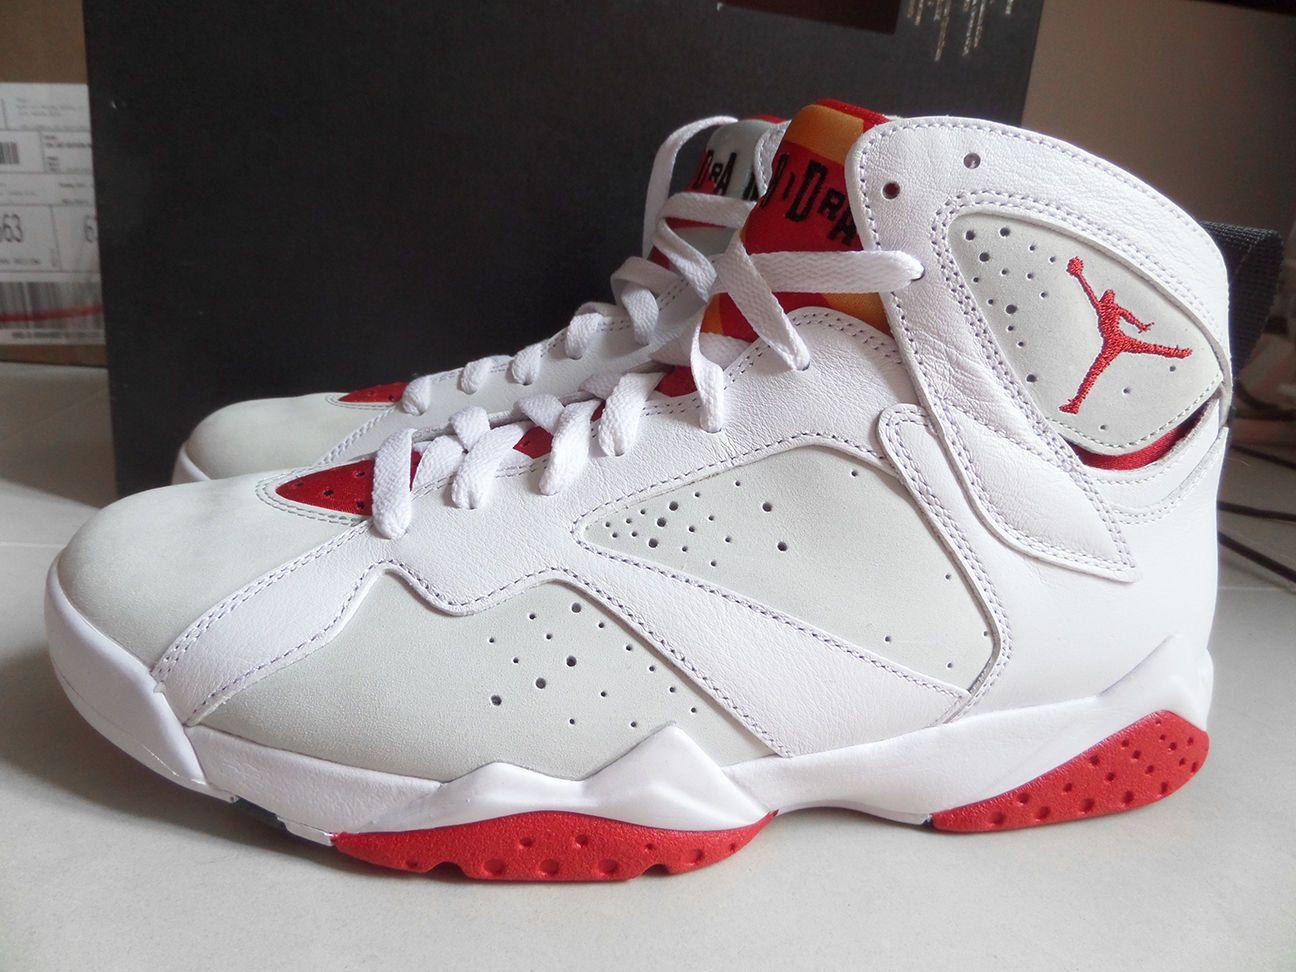 6cbf7fc73f5 100% Auth Nike Air Jordan VII 7 Retro Hare Bugs Bunny sz 9 [304775-125]